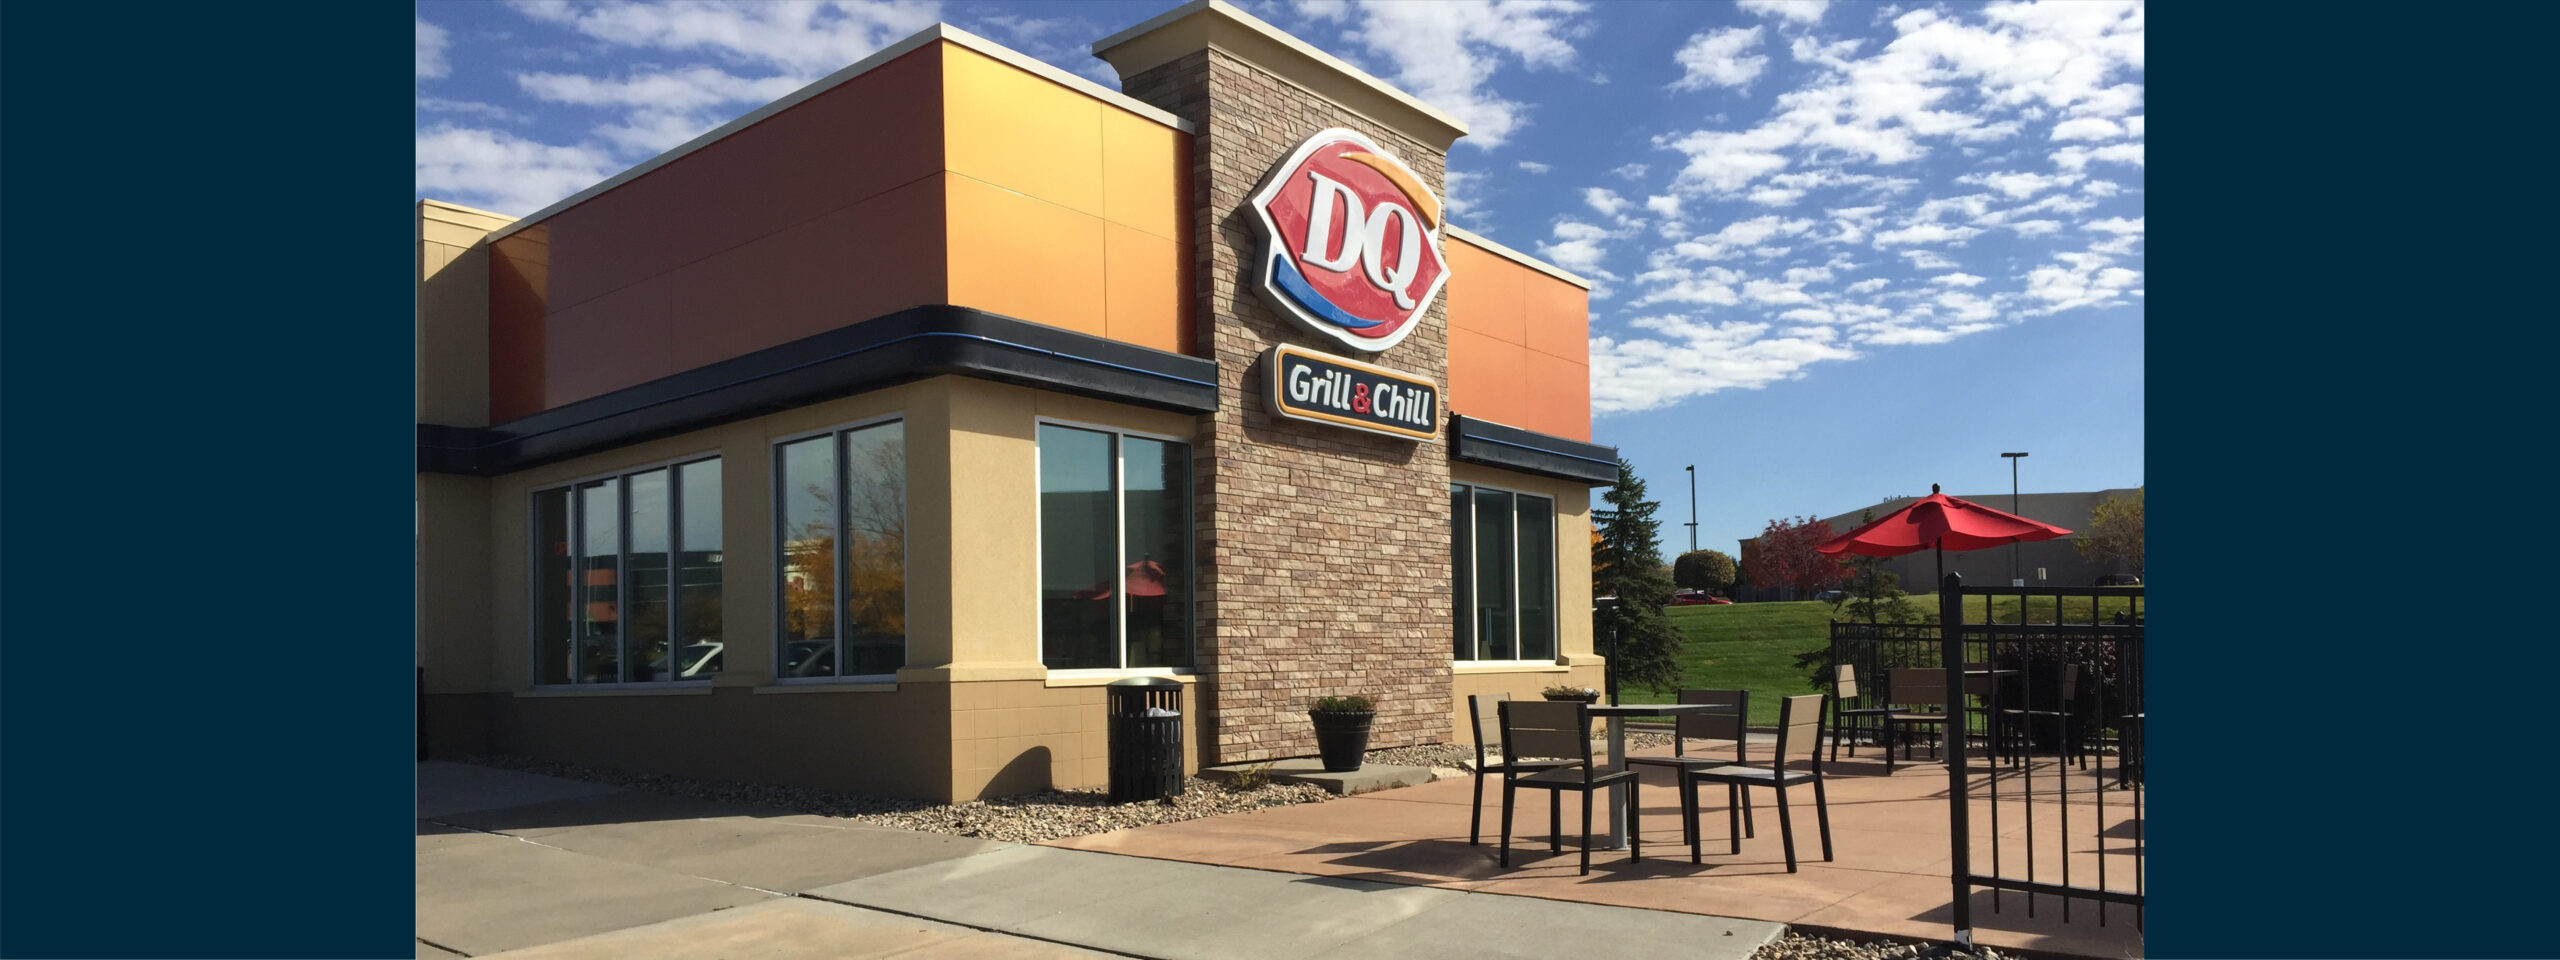 Omaha, NC Fourteen Foods DQ Restaurant